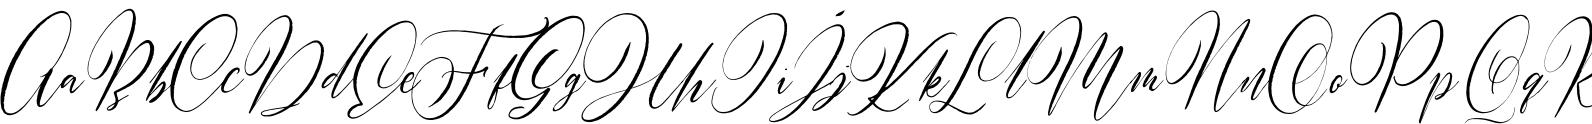 Halosense Script